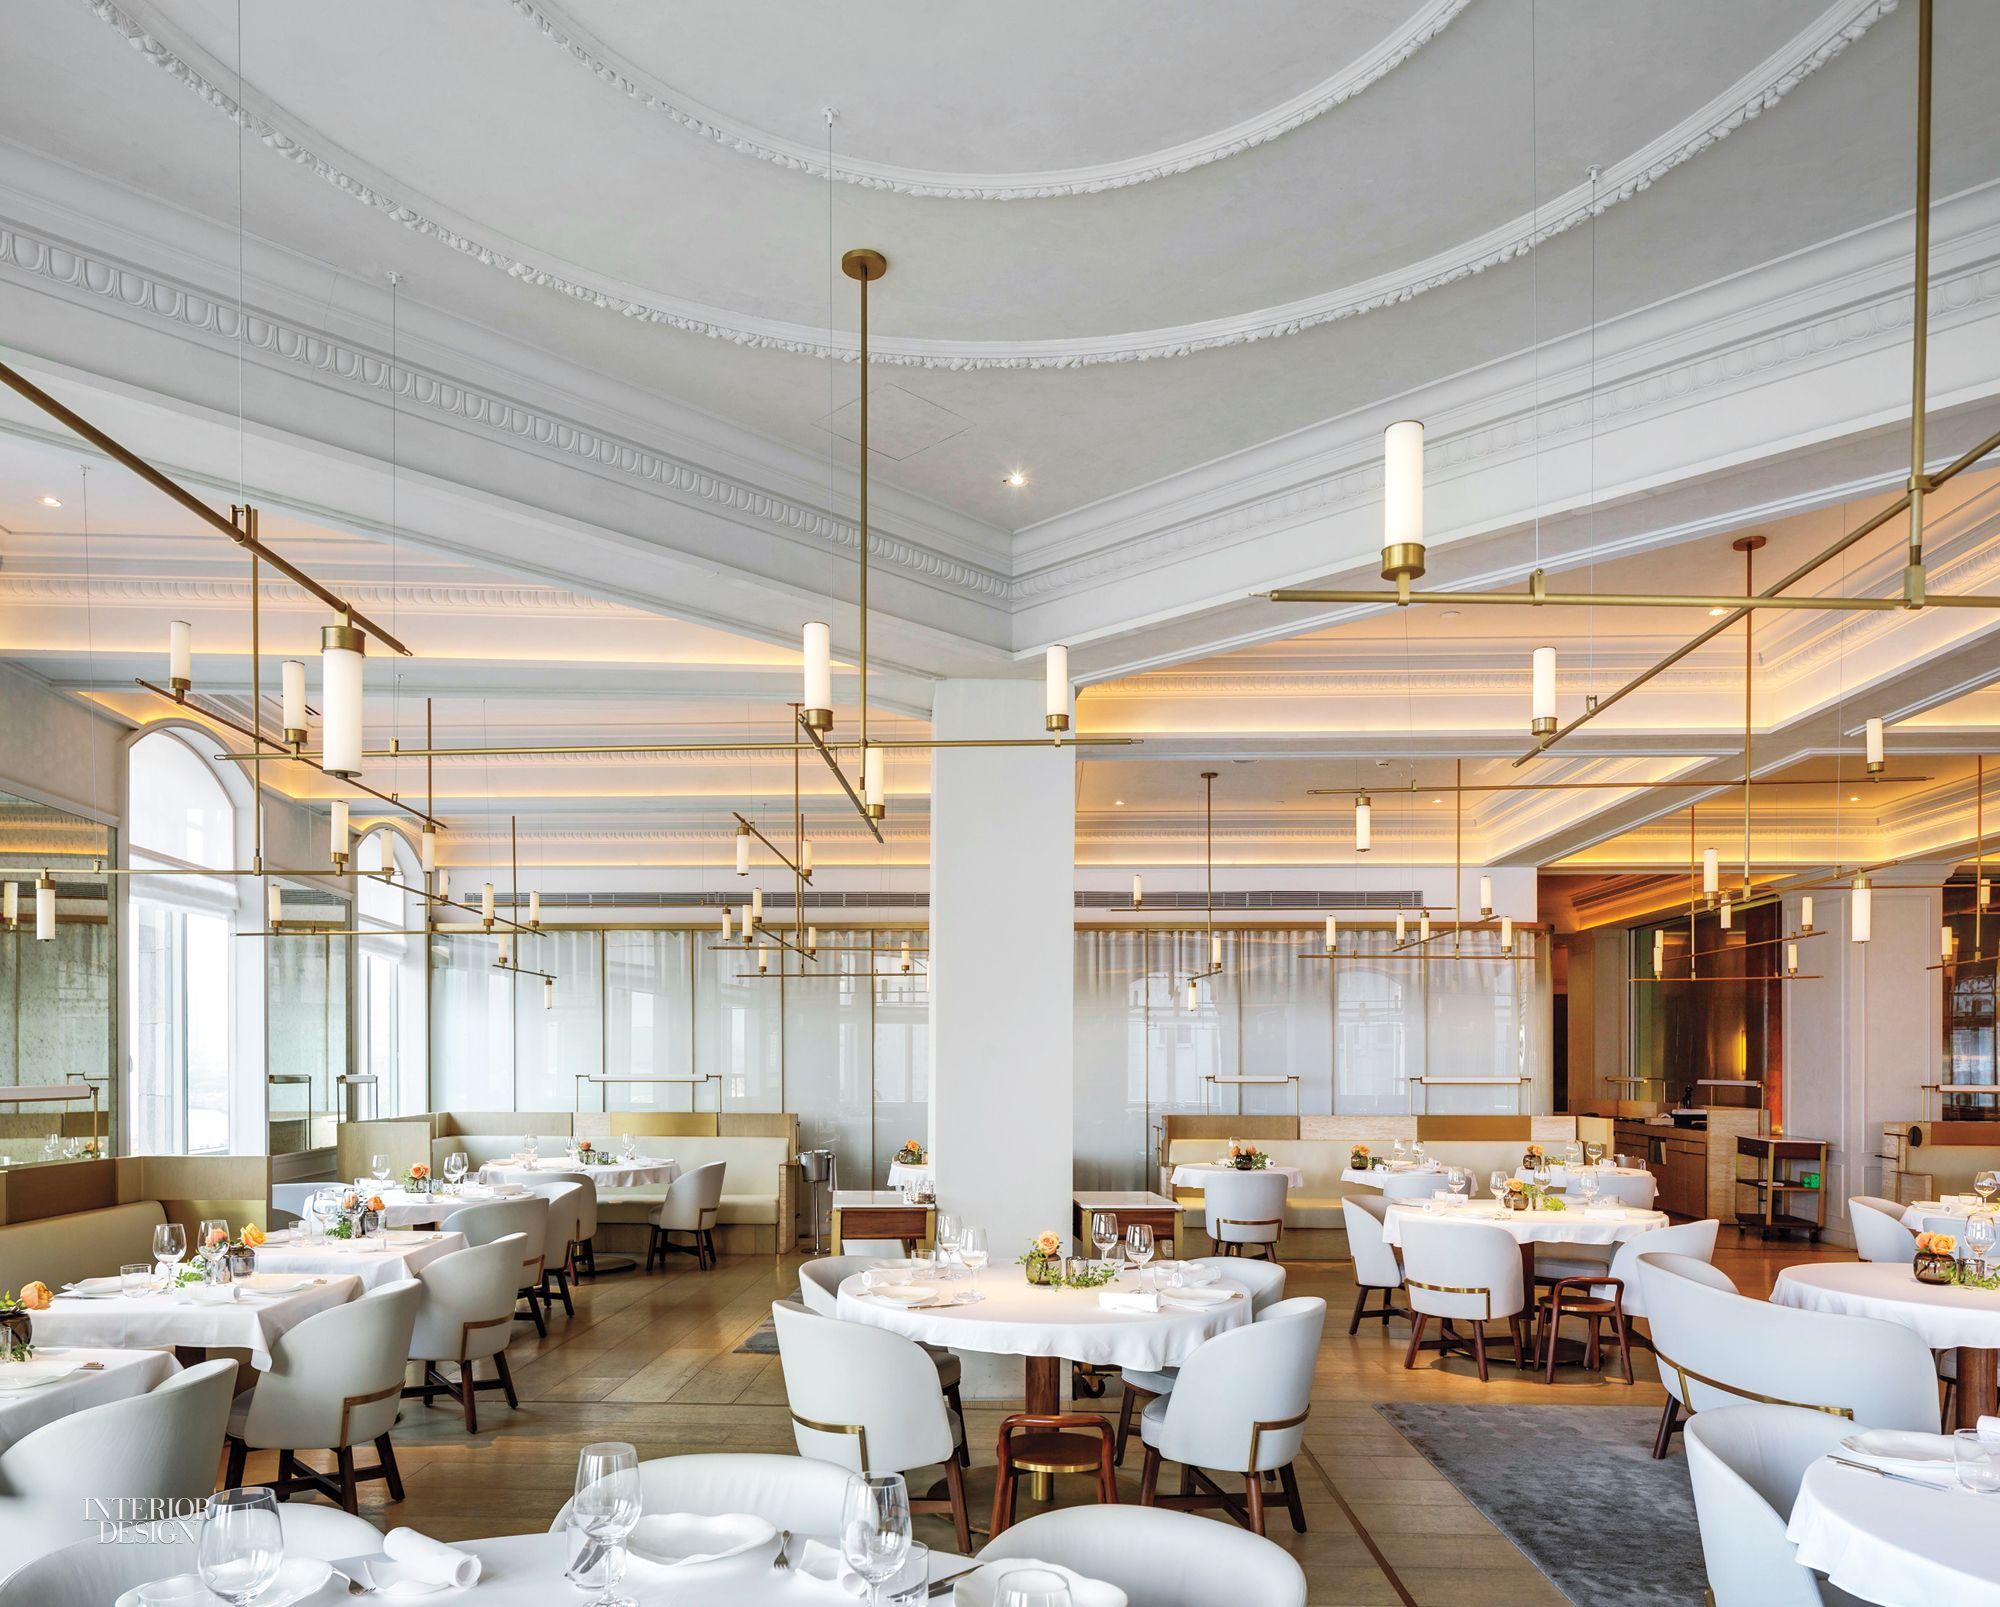 8 Simply Amazing Fine Dining Restaurants Dining Interior Restaurant Interior Design Restaurant Interior